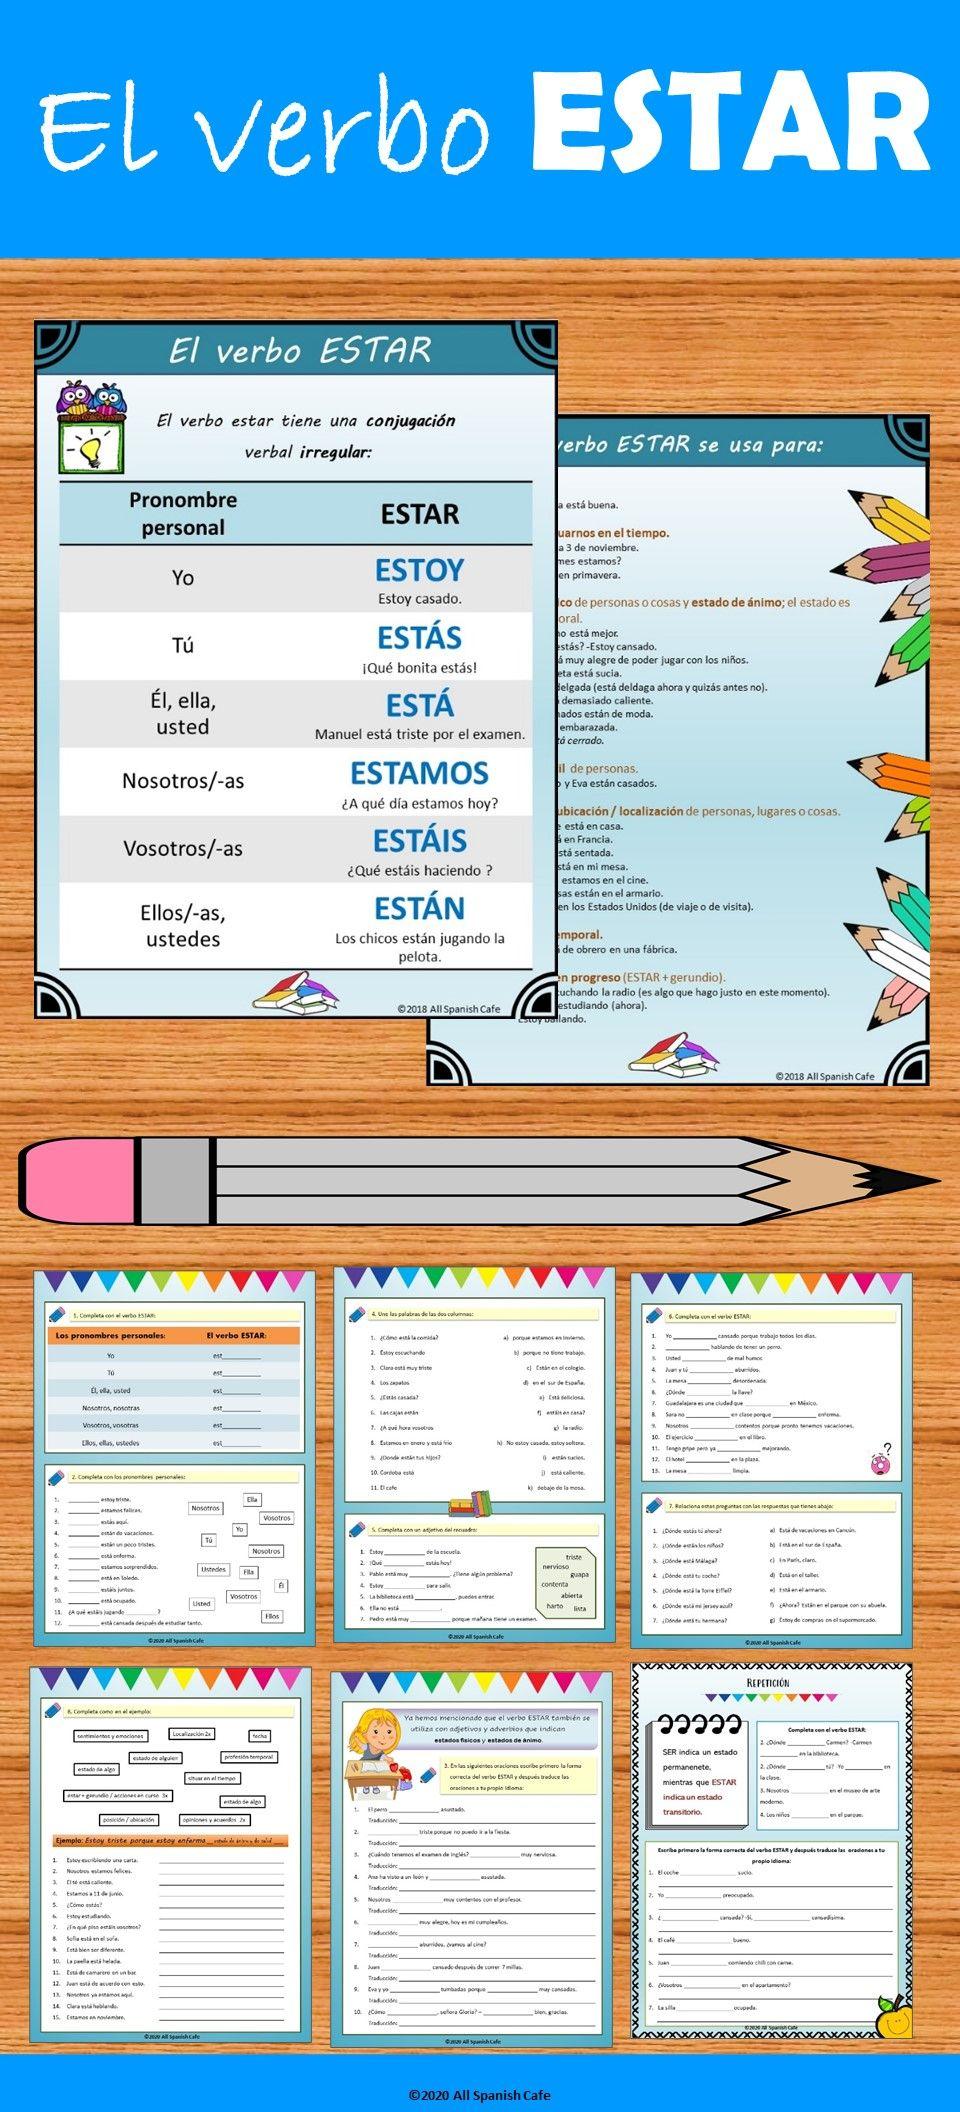 Spanish Verb Estar El Verbo Estar Handouts And Worksheets Spanish Teacher Resources Teaching Spanish Dual Language Classroom [ 2112 x 960 Pixel ]